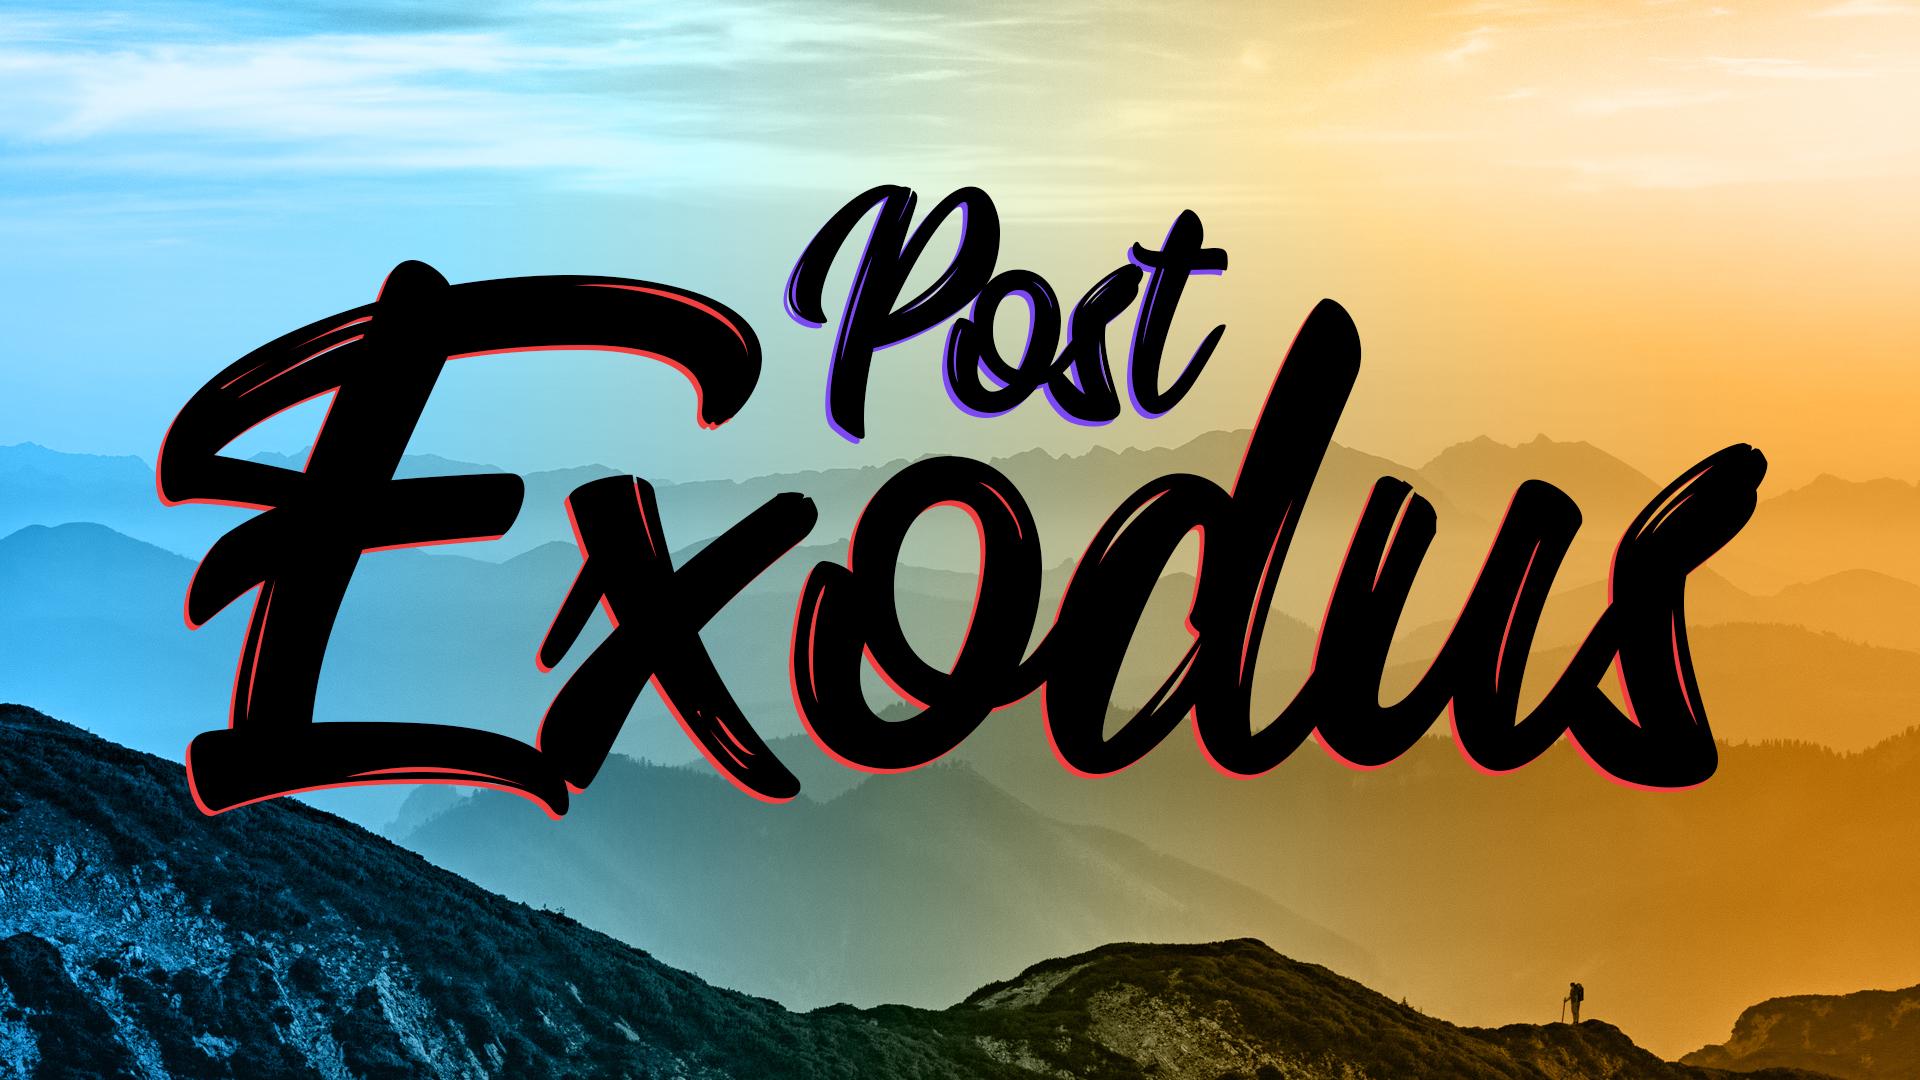 Post-ExodusMain.jpg